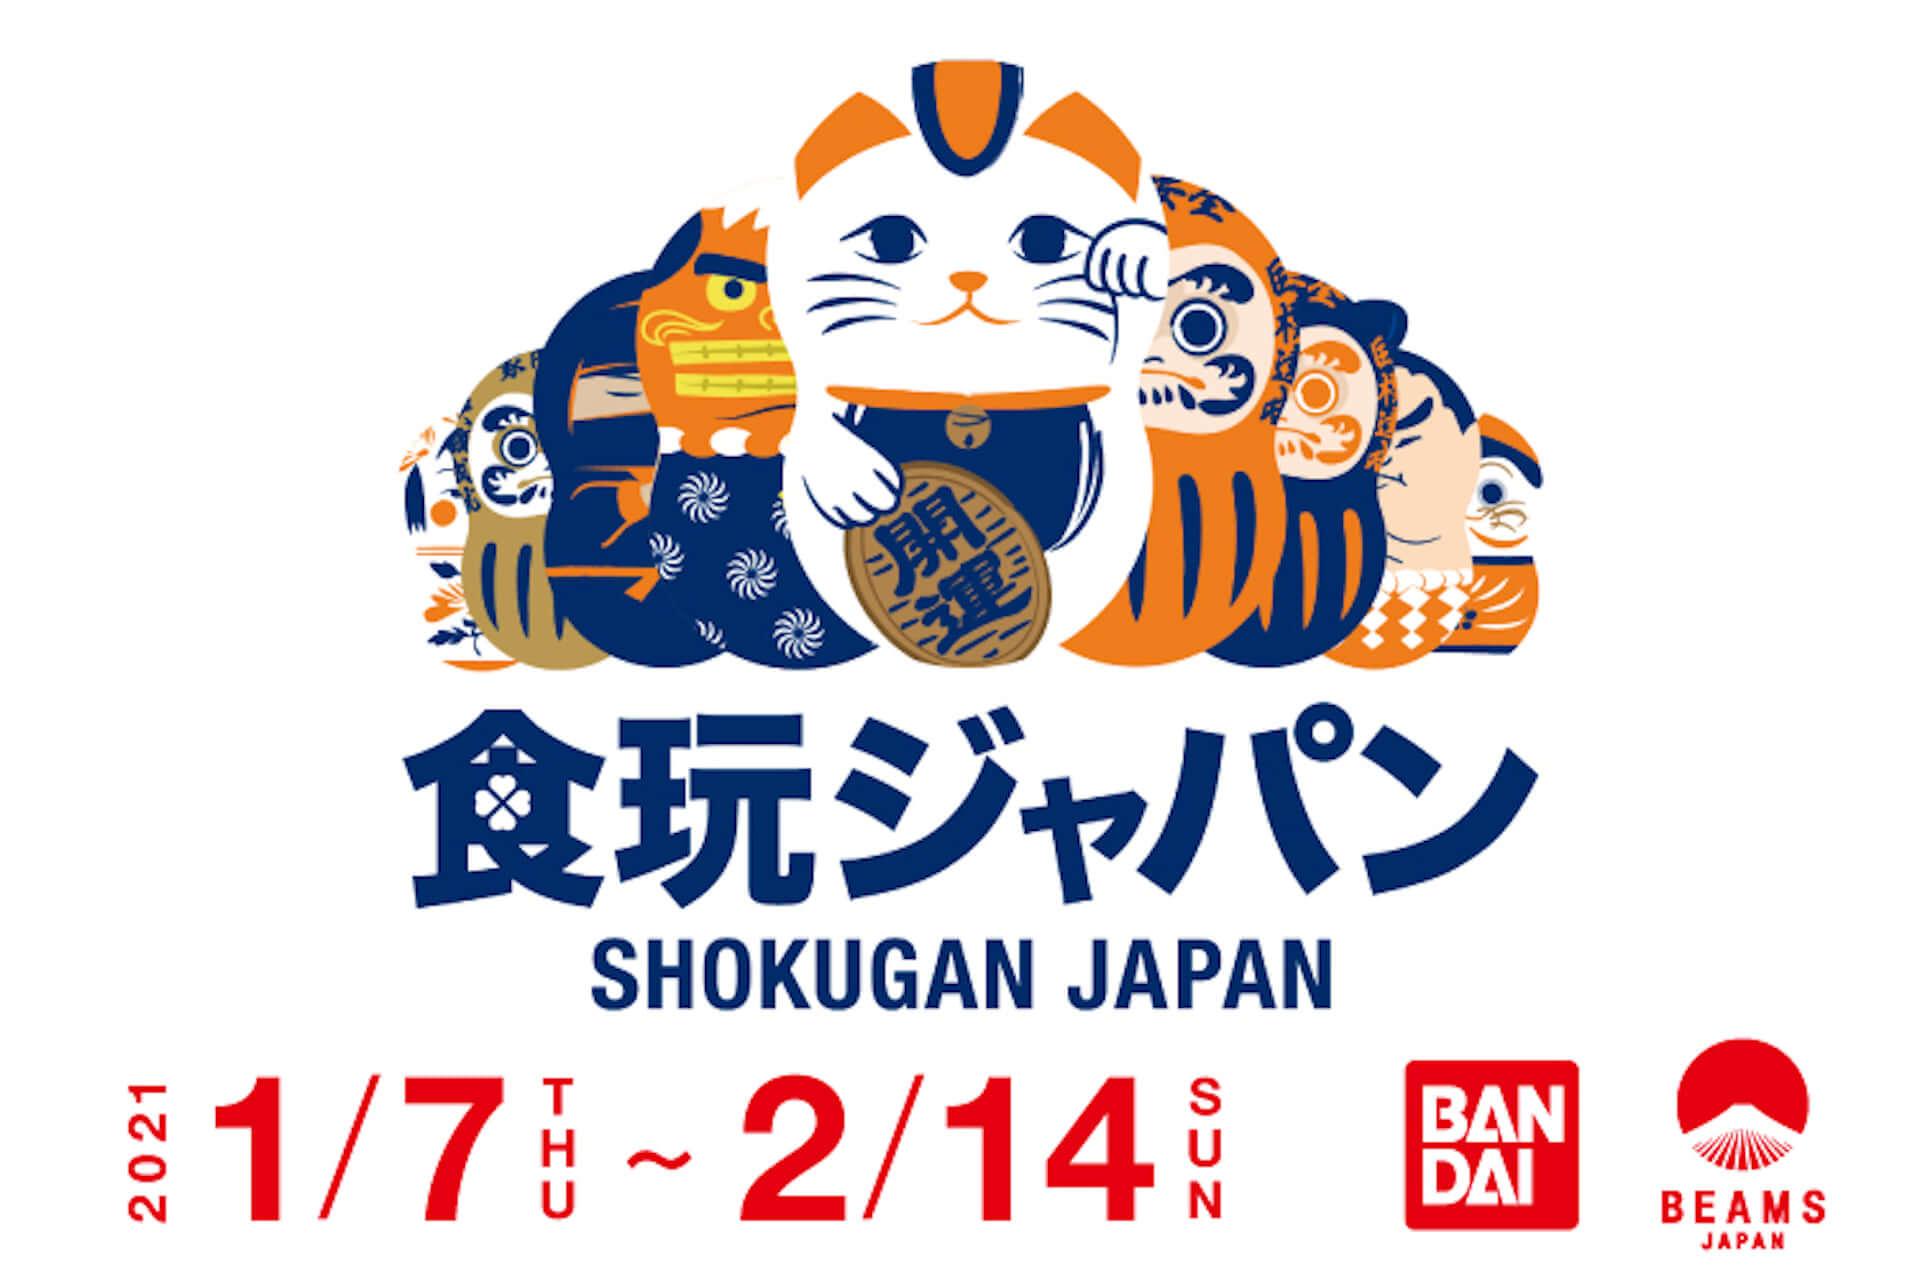 "BEAMS JAPANとバンダイが""食玩""の魅力を発信する新プロジェクトを始動!錦鯉、ラランドら出演の漫才動画や限定デザインの『クーナッツ』など展開 art210108_shokuganjapan_3-1920x1280"